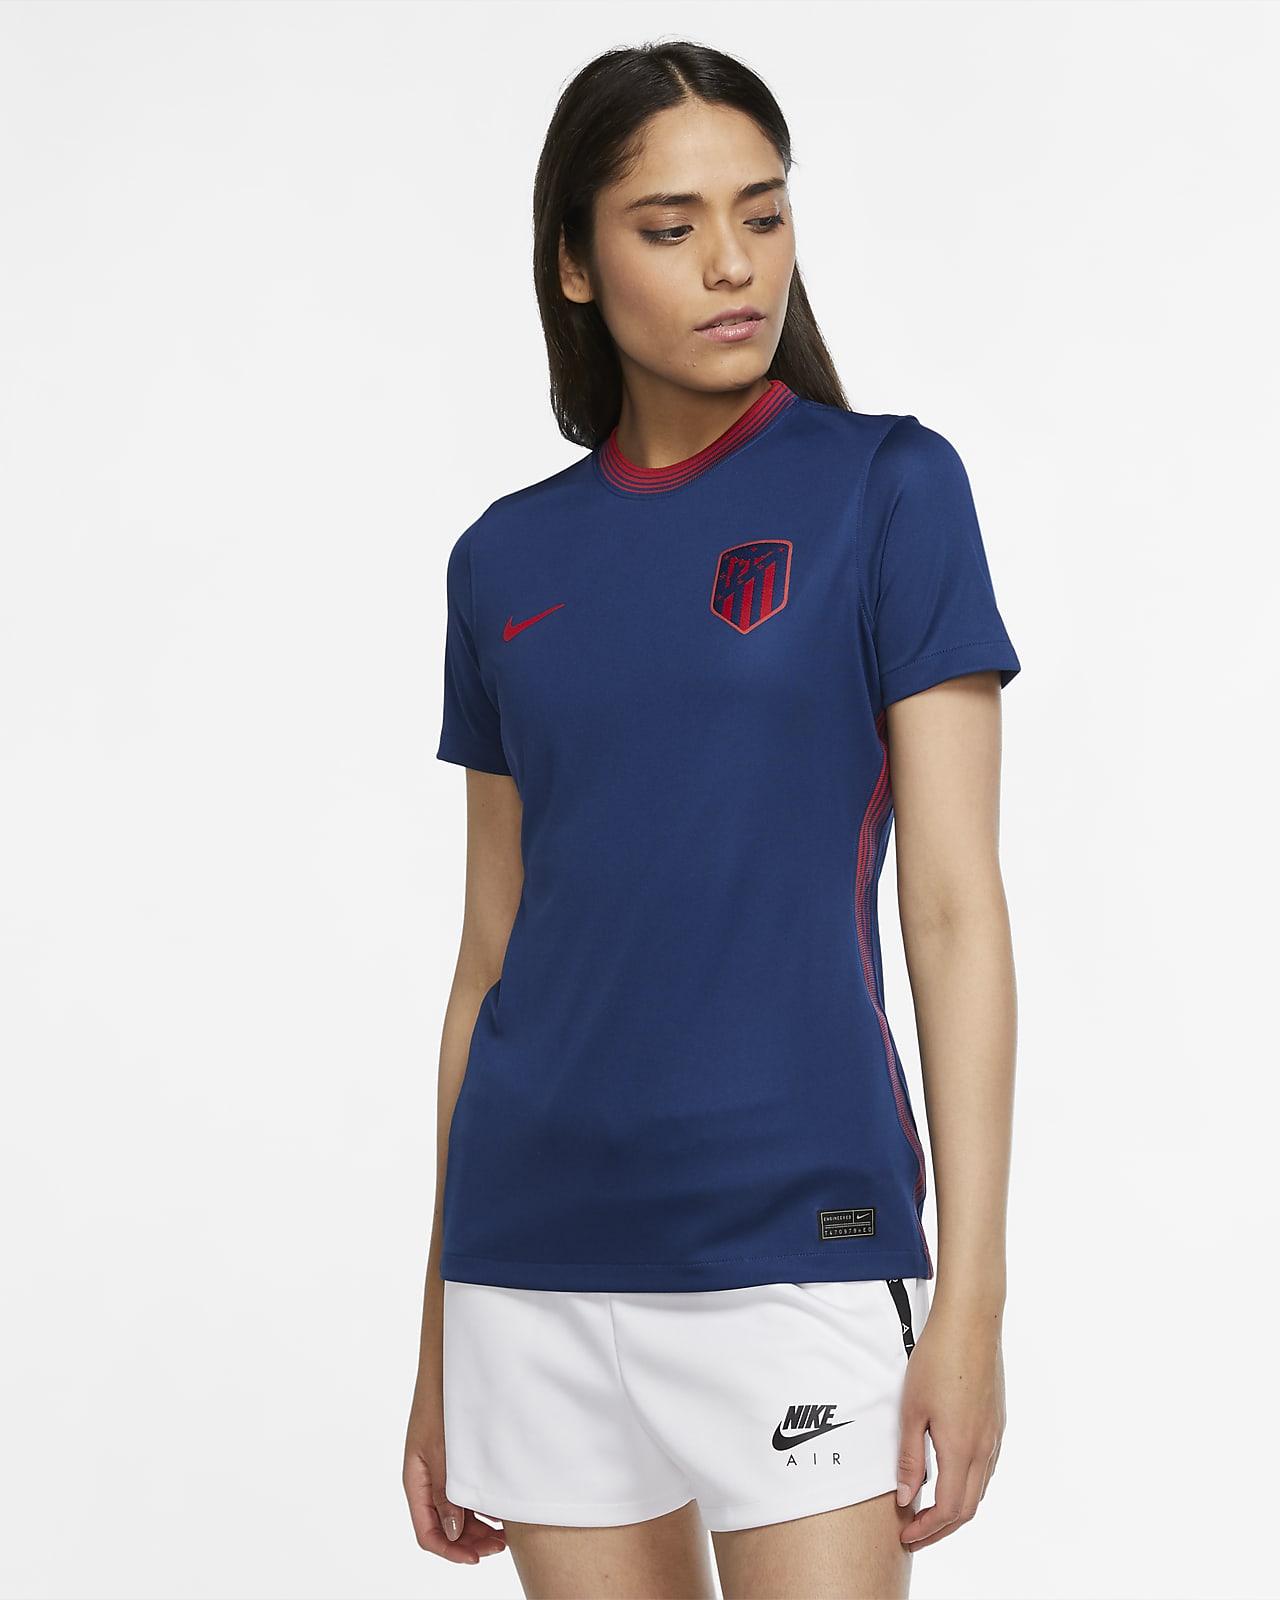 Atlético de Madrid 2020/21 Stadium Away Women's Football Shirt